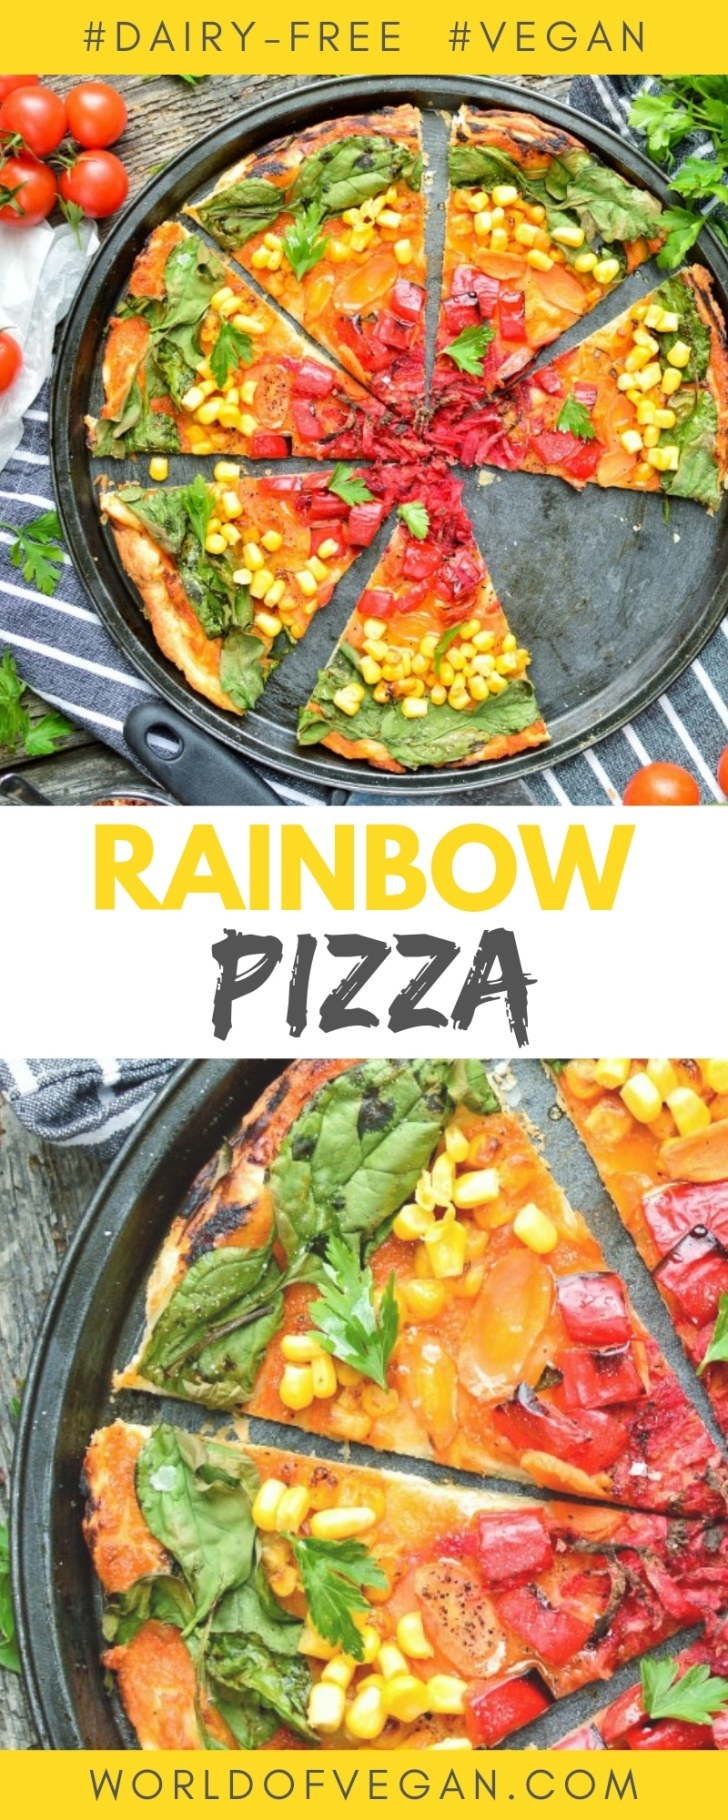 Vegan Rainbow Pizza | Easy & Quick Dinner Recipe | World of Vegan | #healthy #pizza #dairyfree #quick #easy #italian #worldofvegan